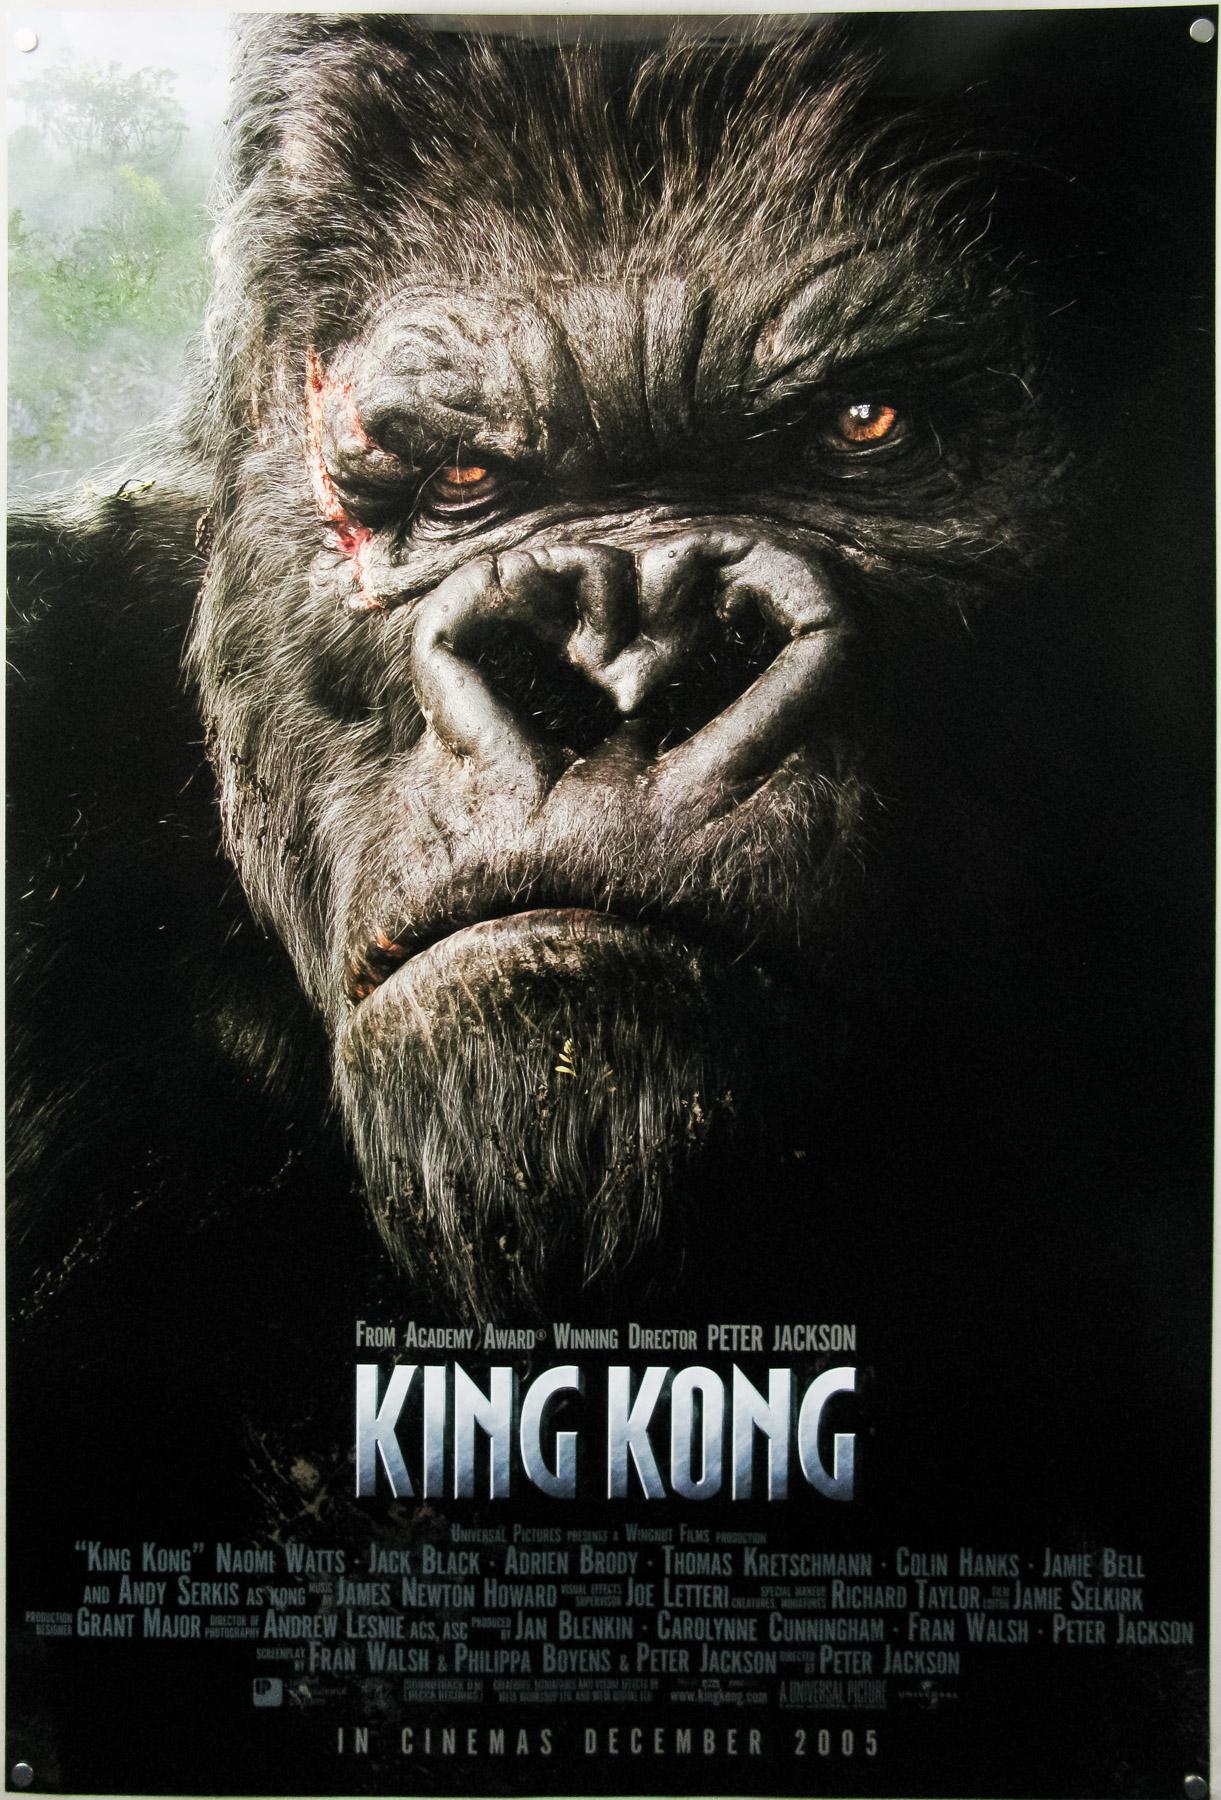 King Kong 2005 One Sheet Advance Kong Portrait Style International